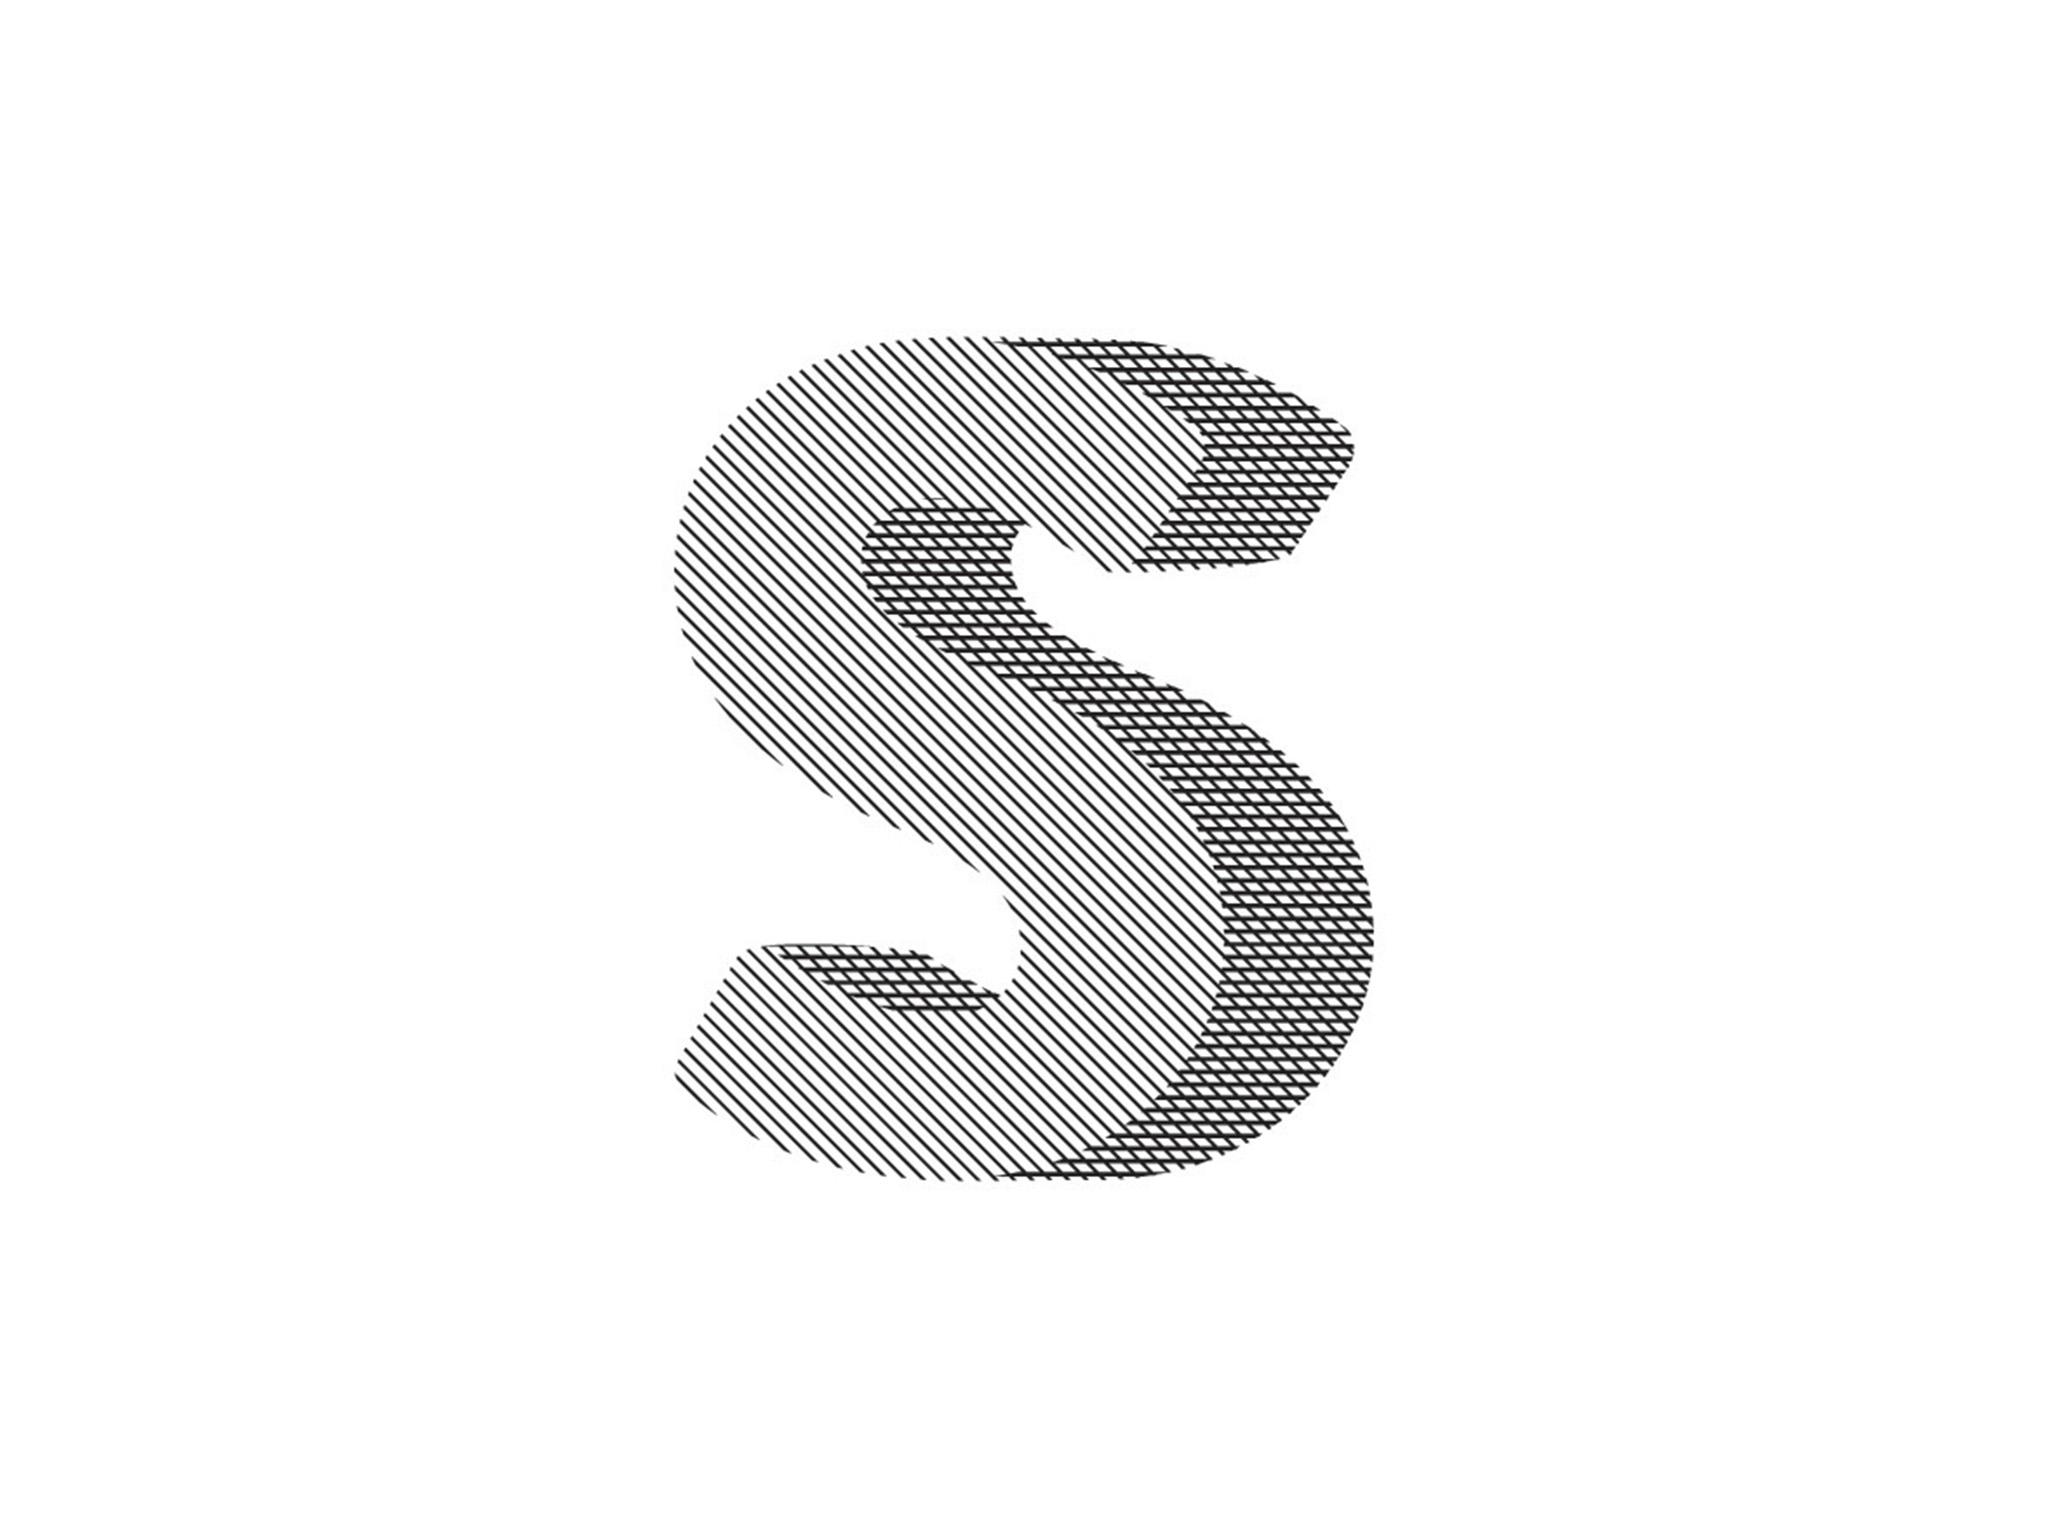 apex_letters_horizontal_large_0021_2_final_alphabet coasters-19.jpg